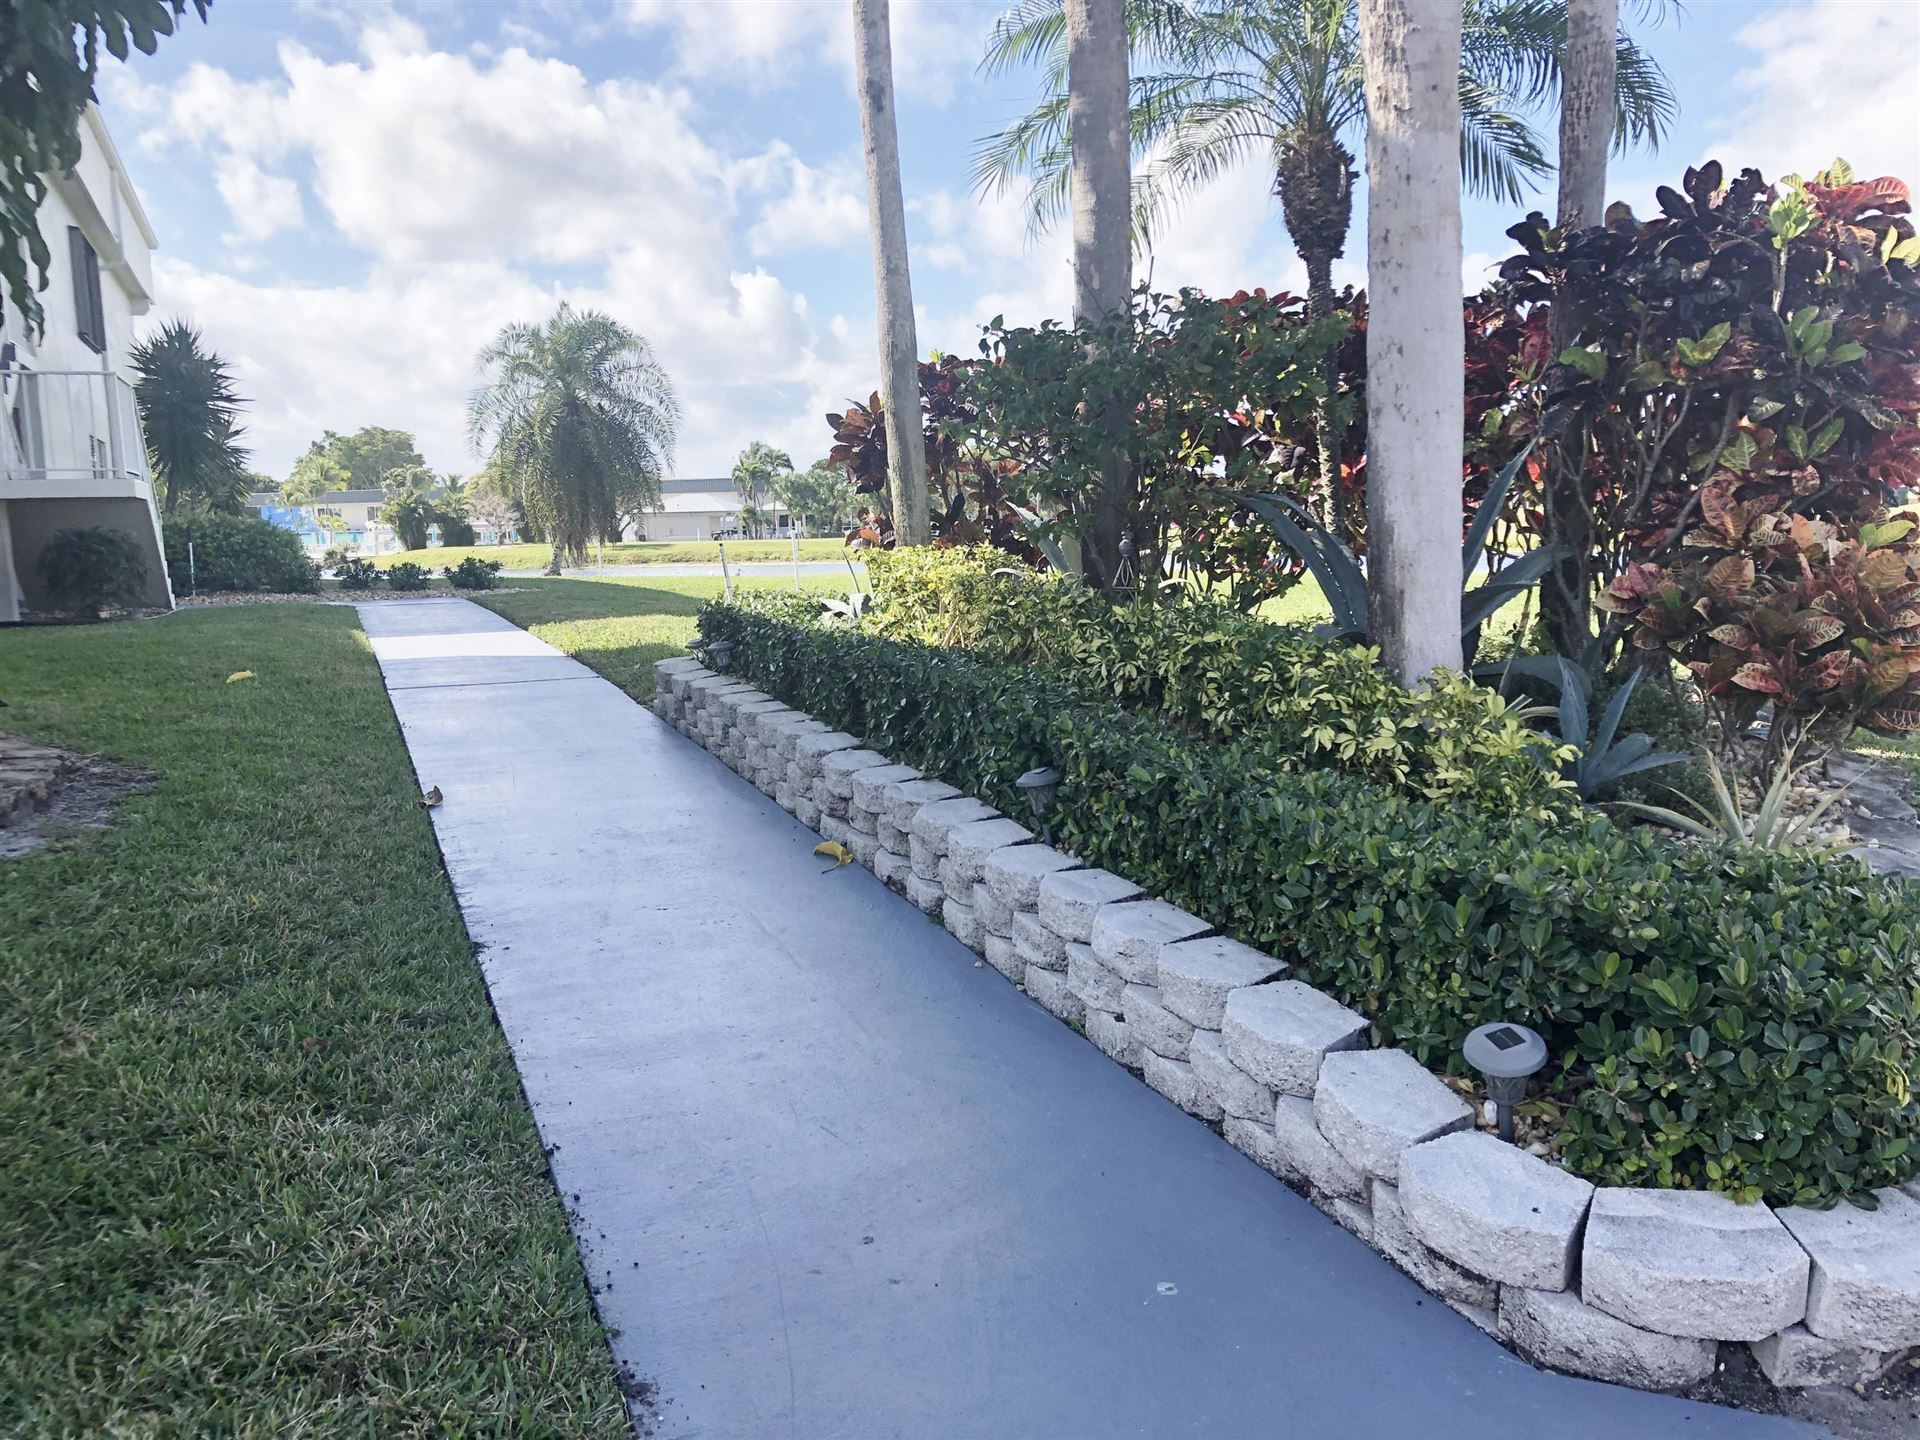 19 Capri A, Delray Beach, FL 33484 - MLS#: RX-10689198